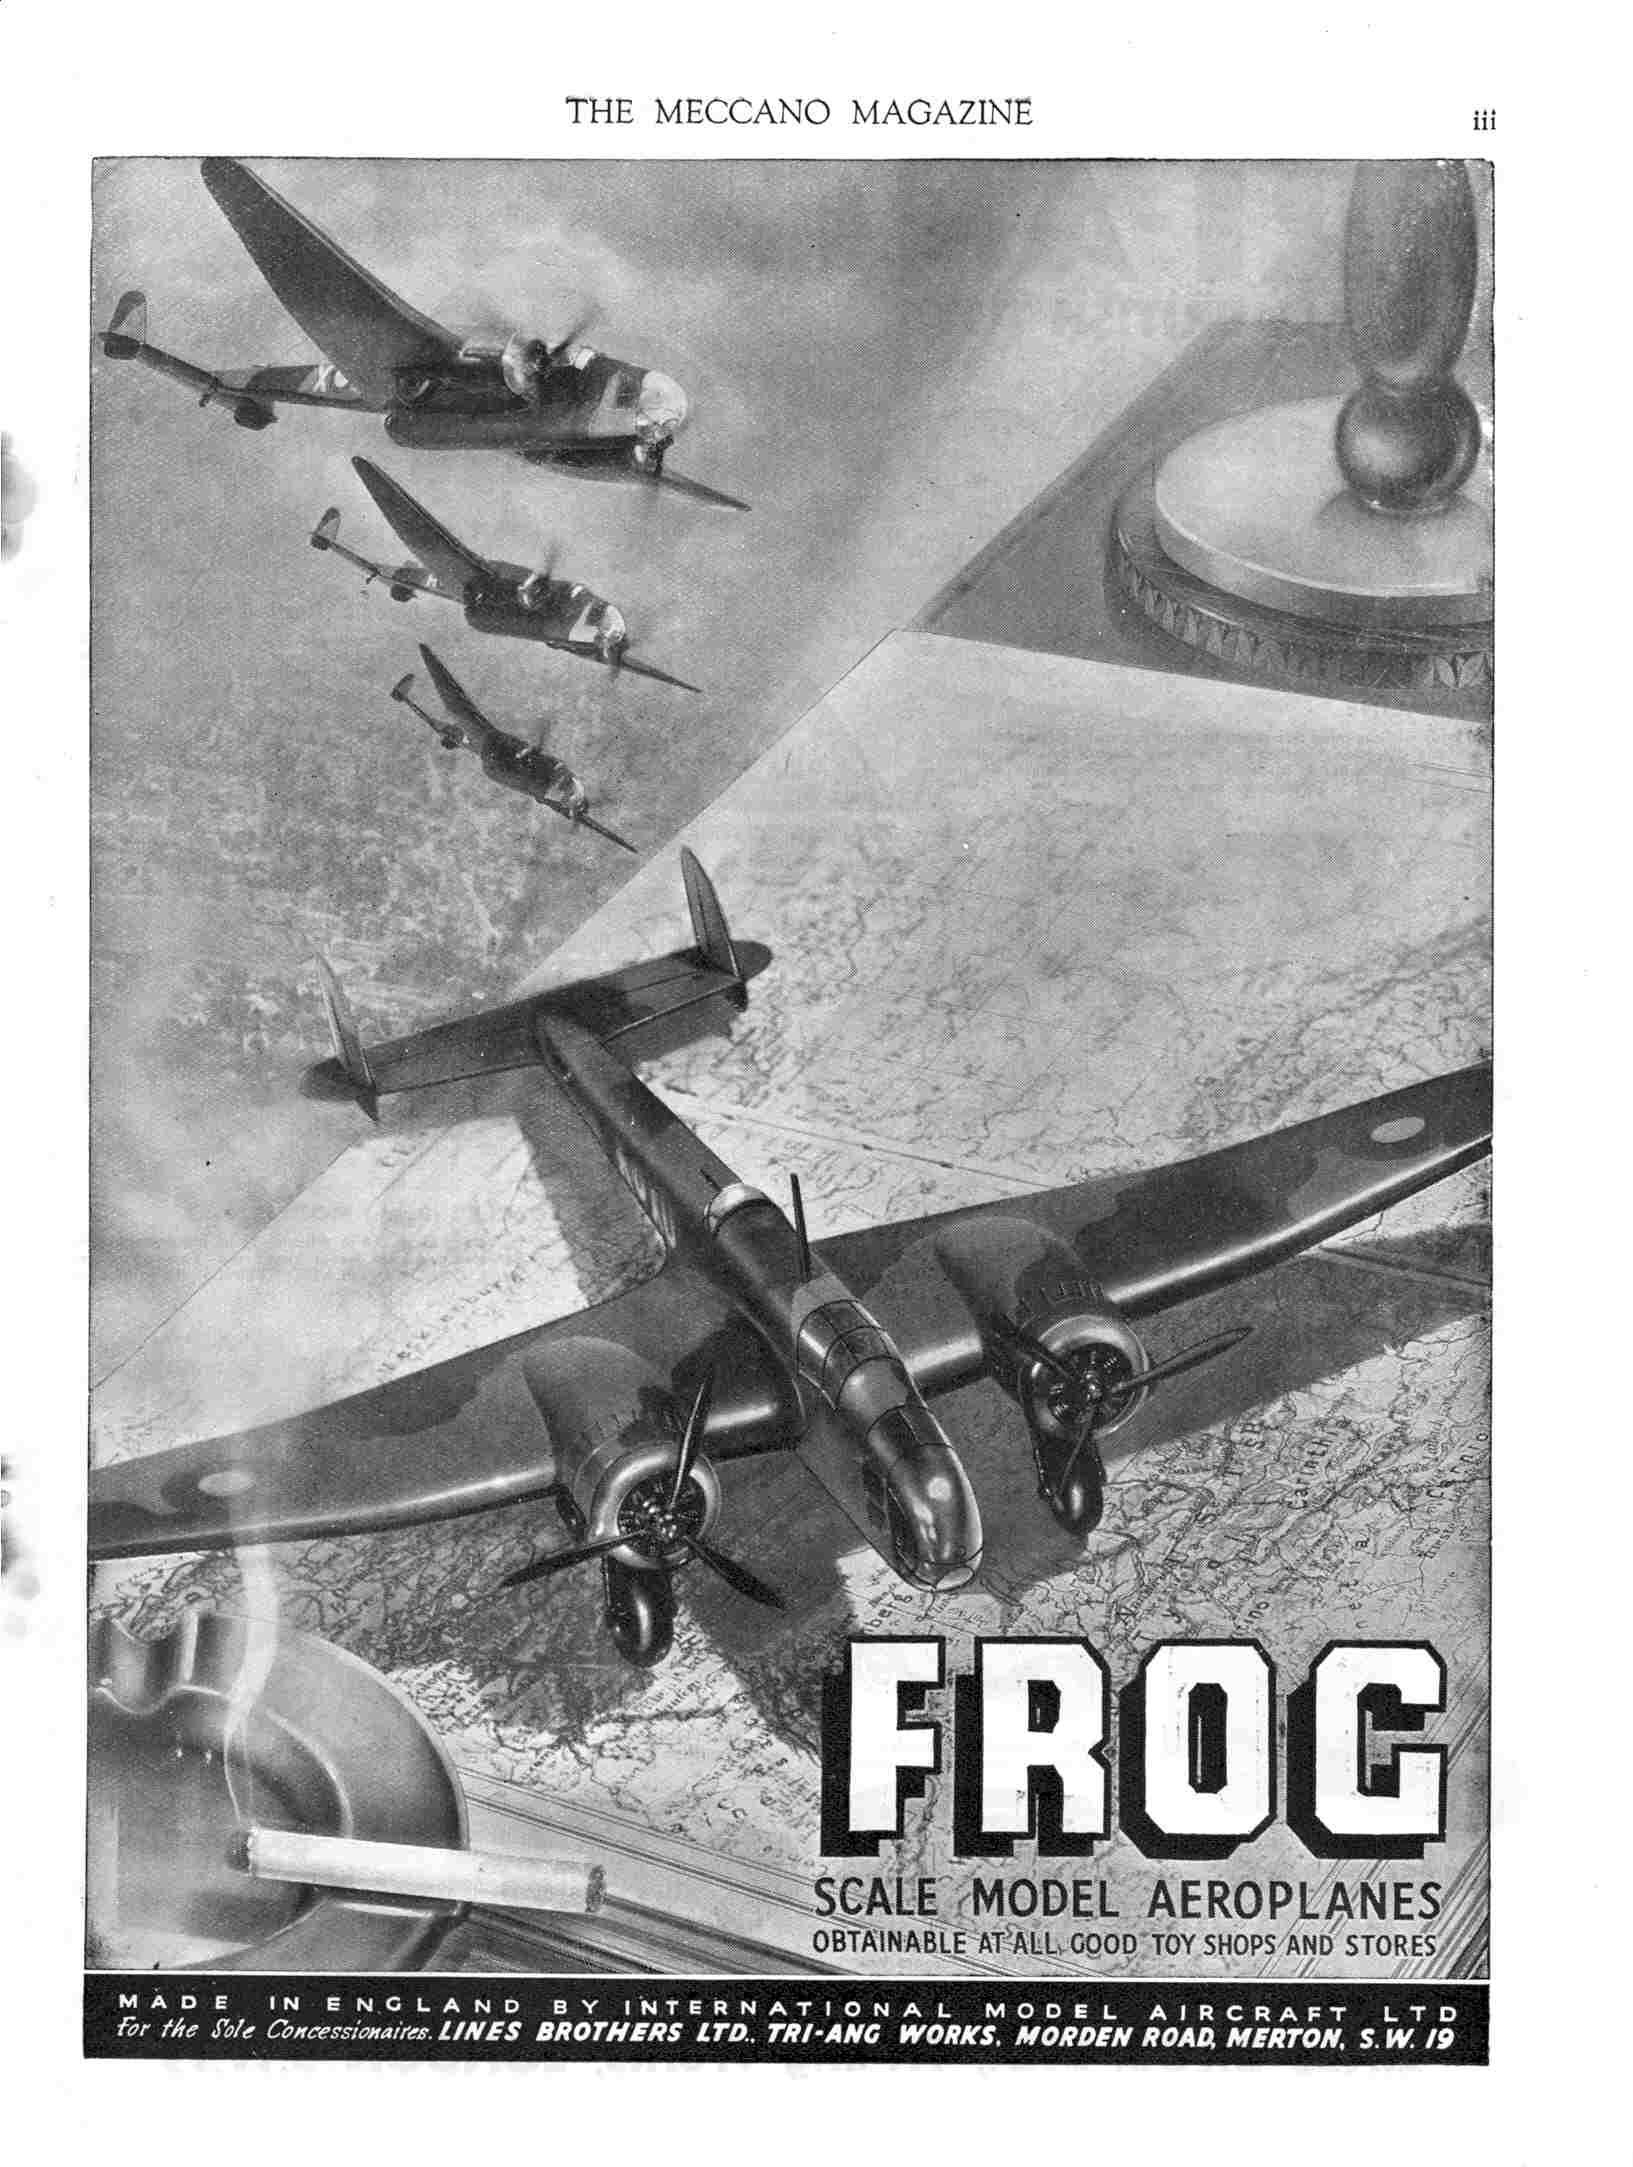 UK Meccano Magazine April 1941 Page iii